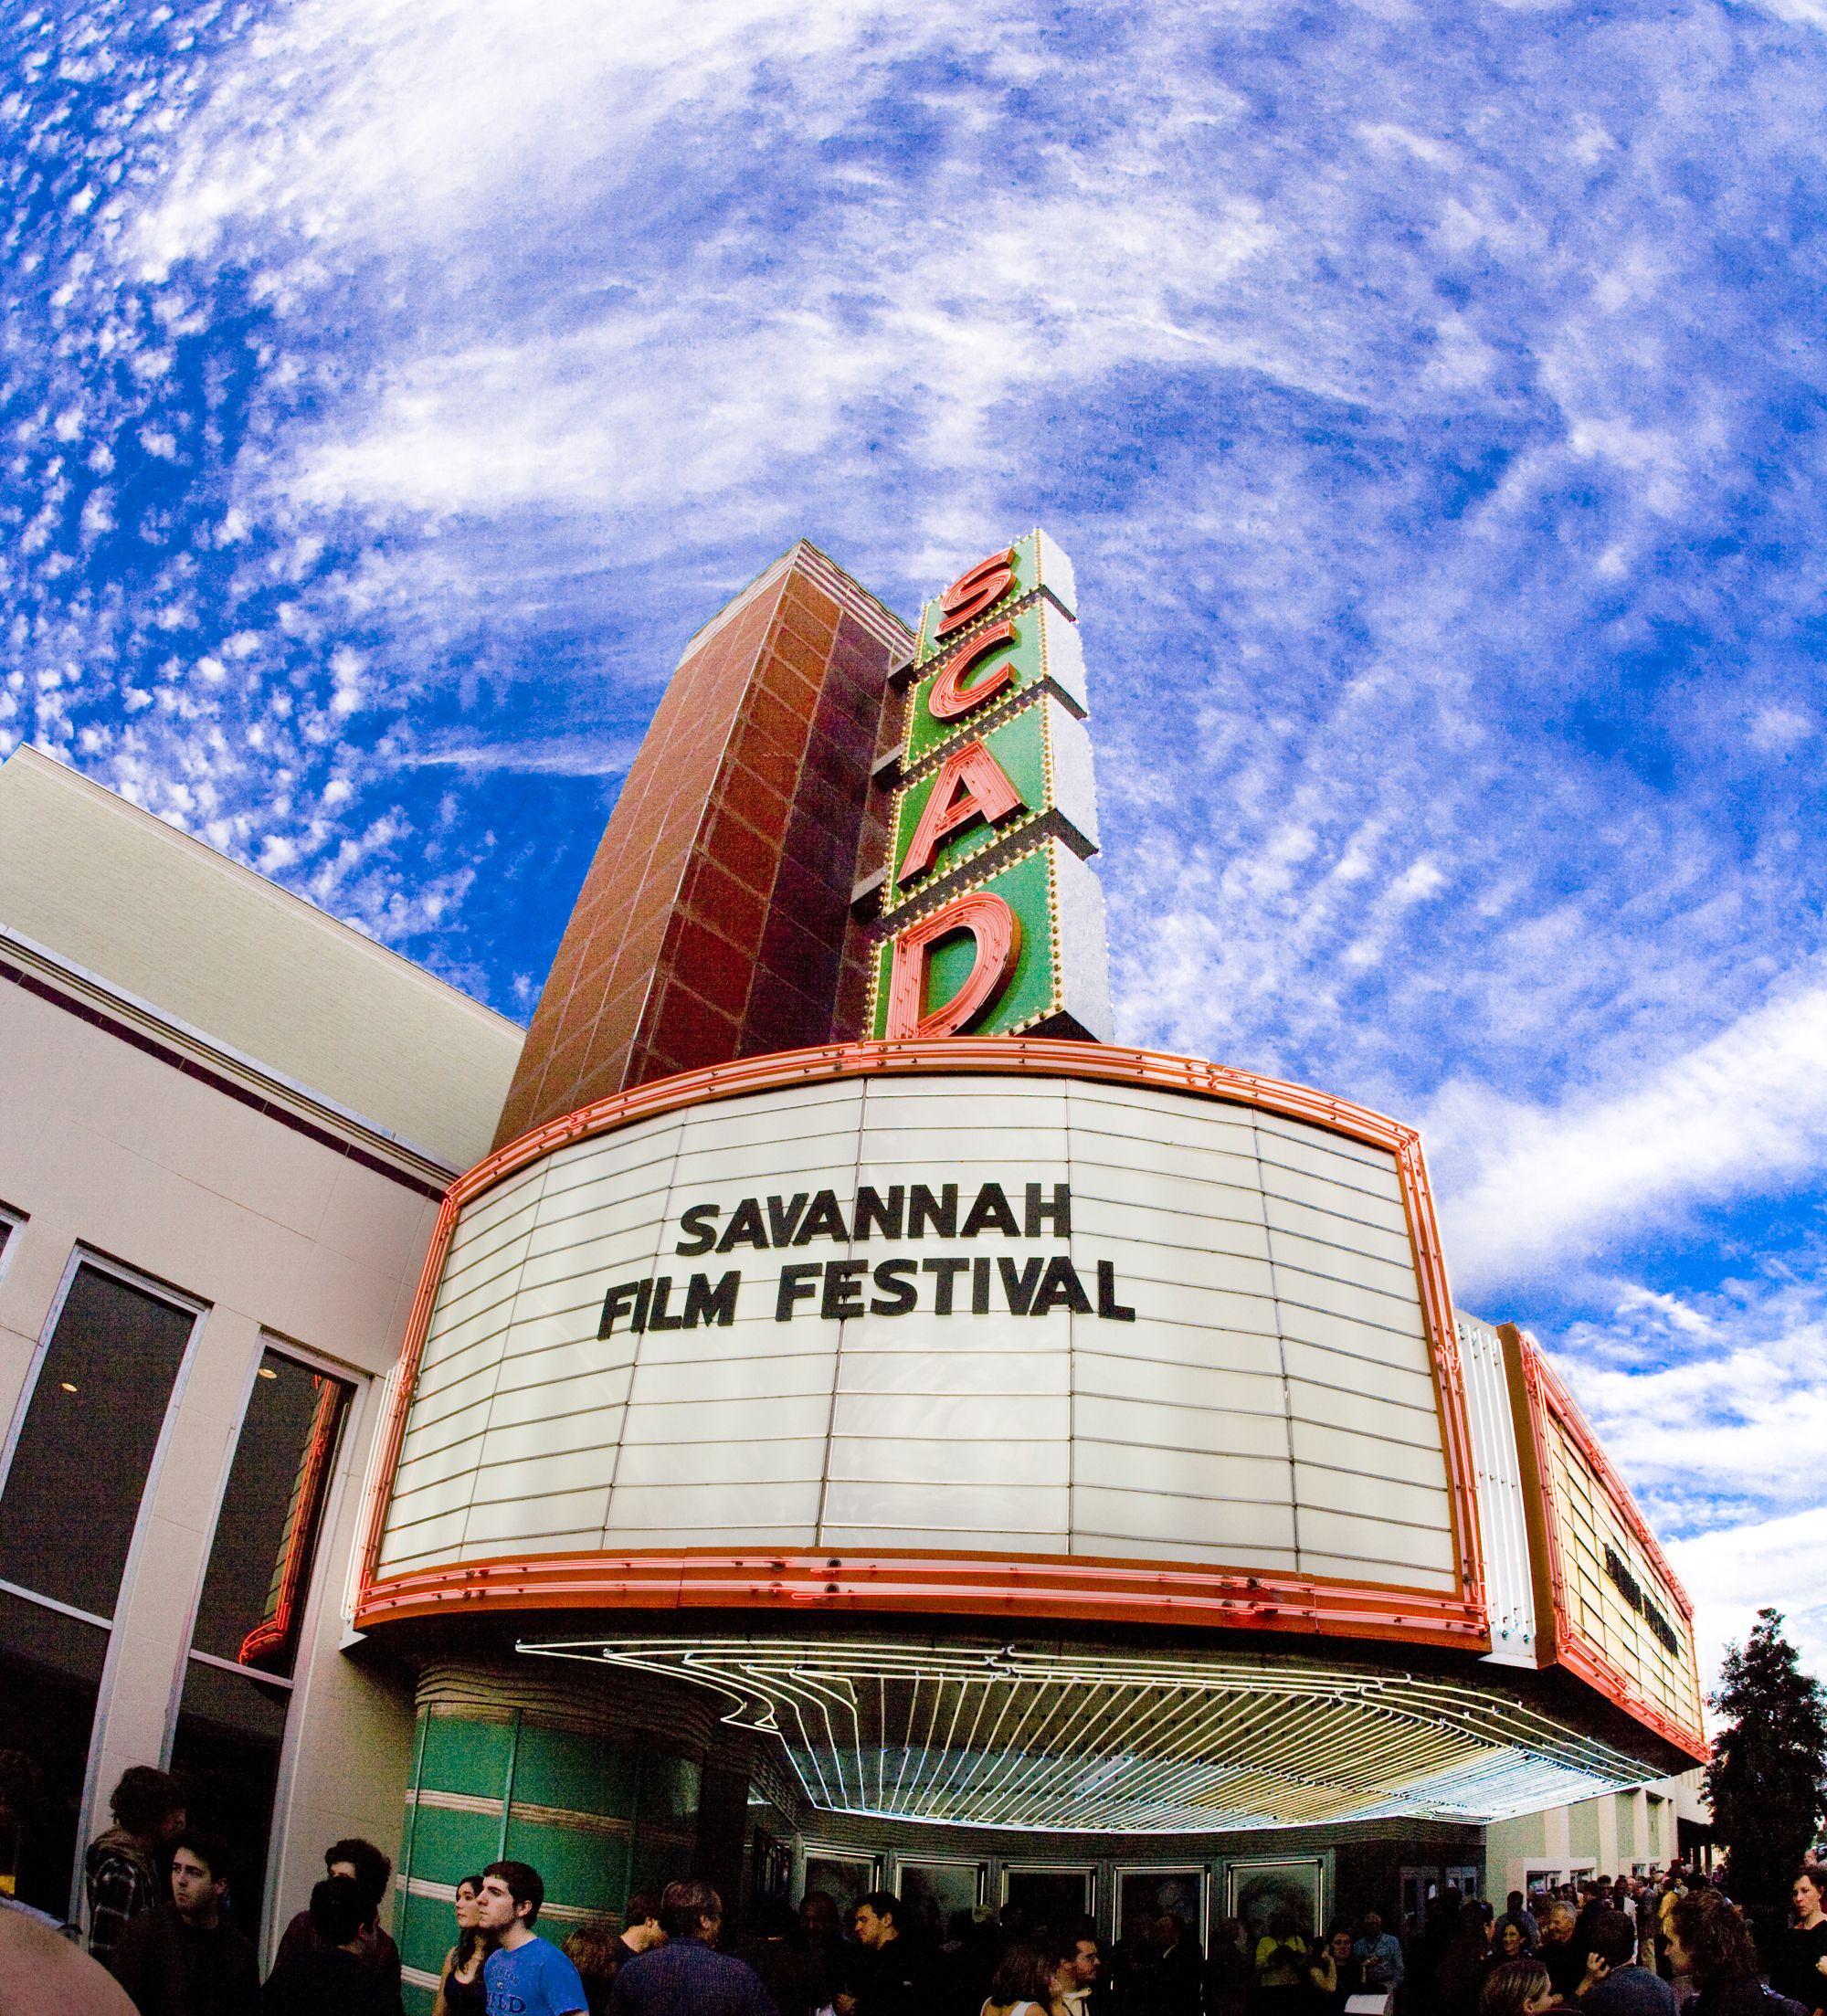 Savannah Film Festival Savff With Images Savannah Chat Film